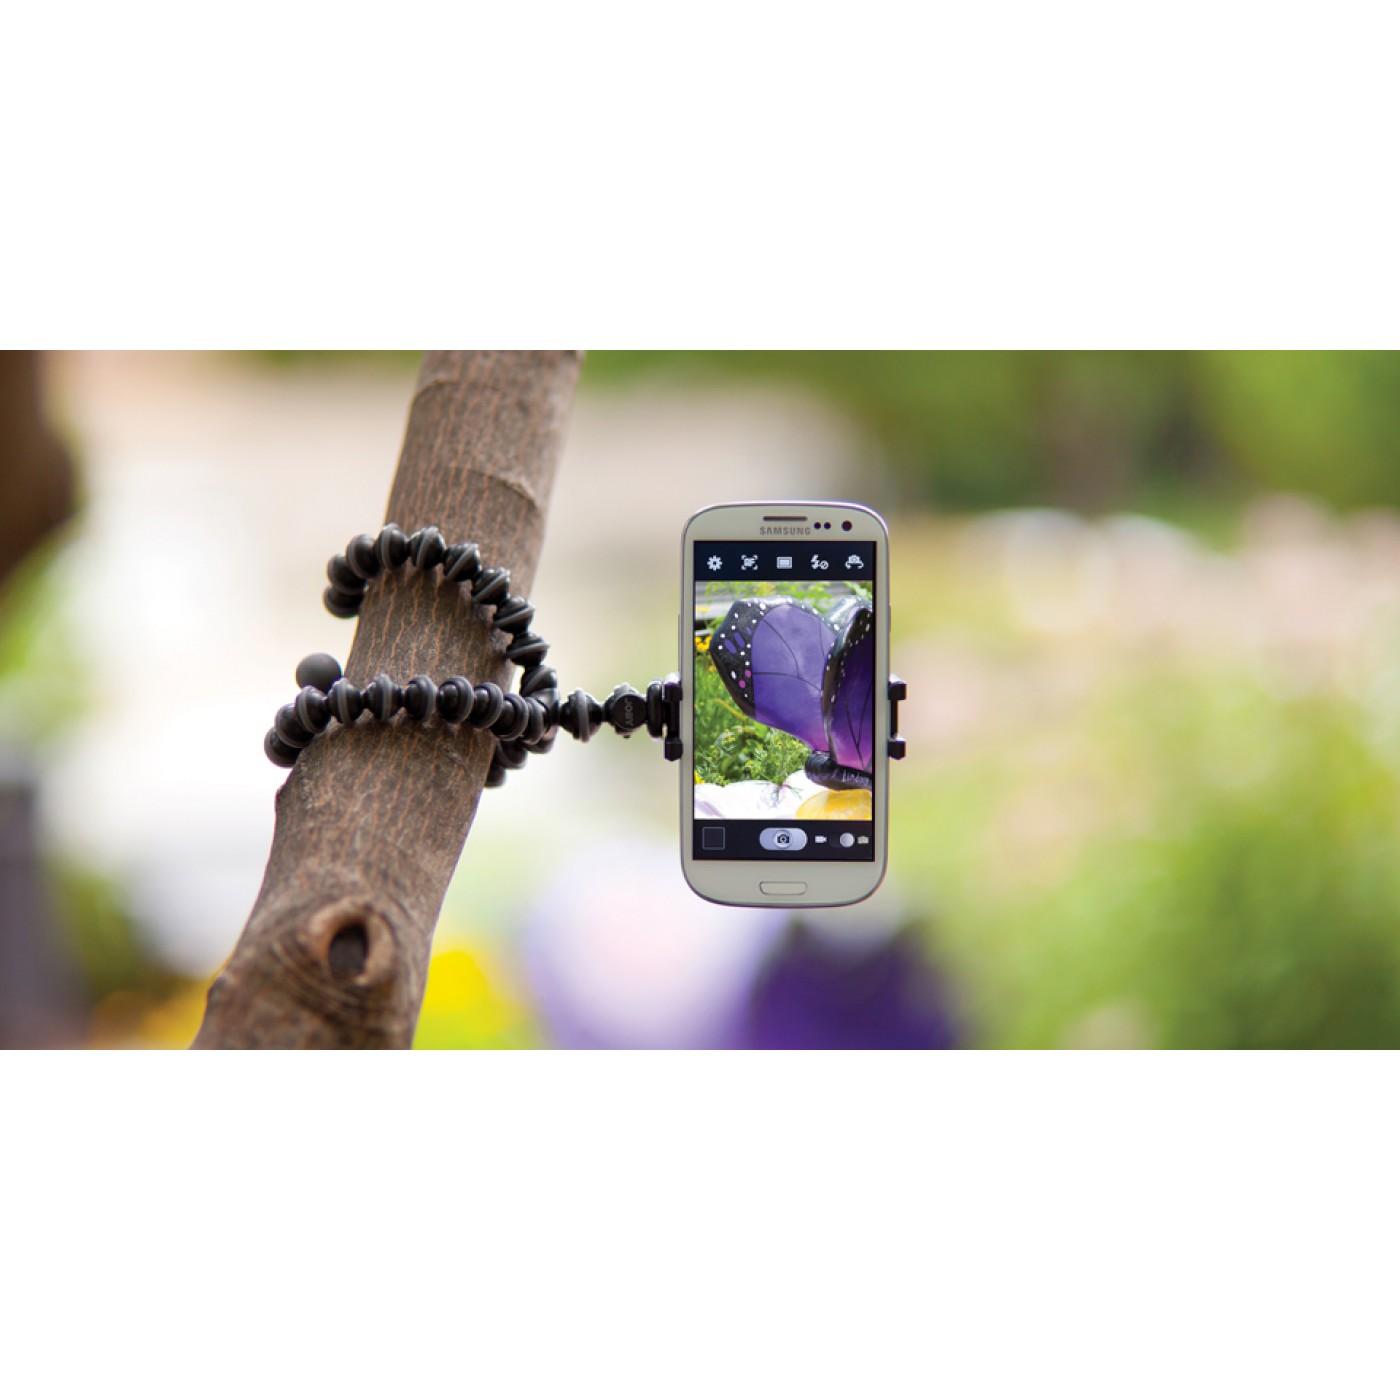 mini gorillapod klemmstativ f r smartphone. Black Bedroom Furniture Sets. Home Design Ideas